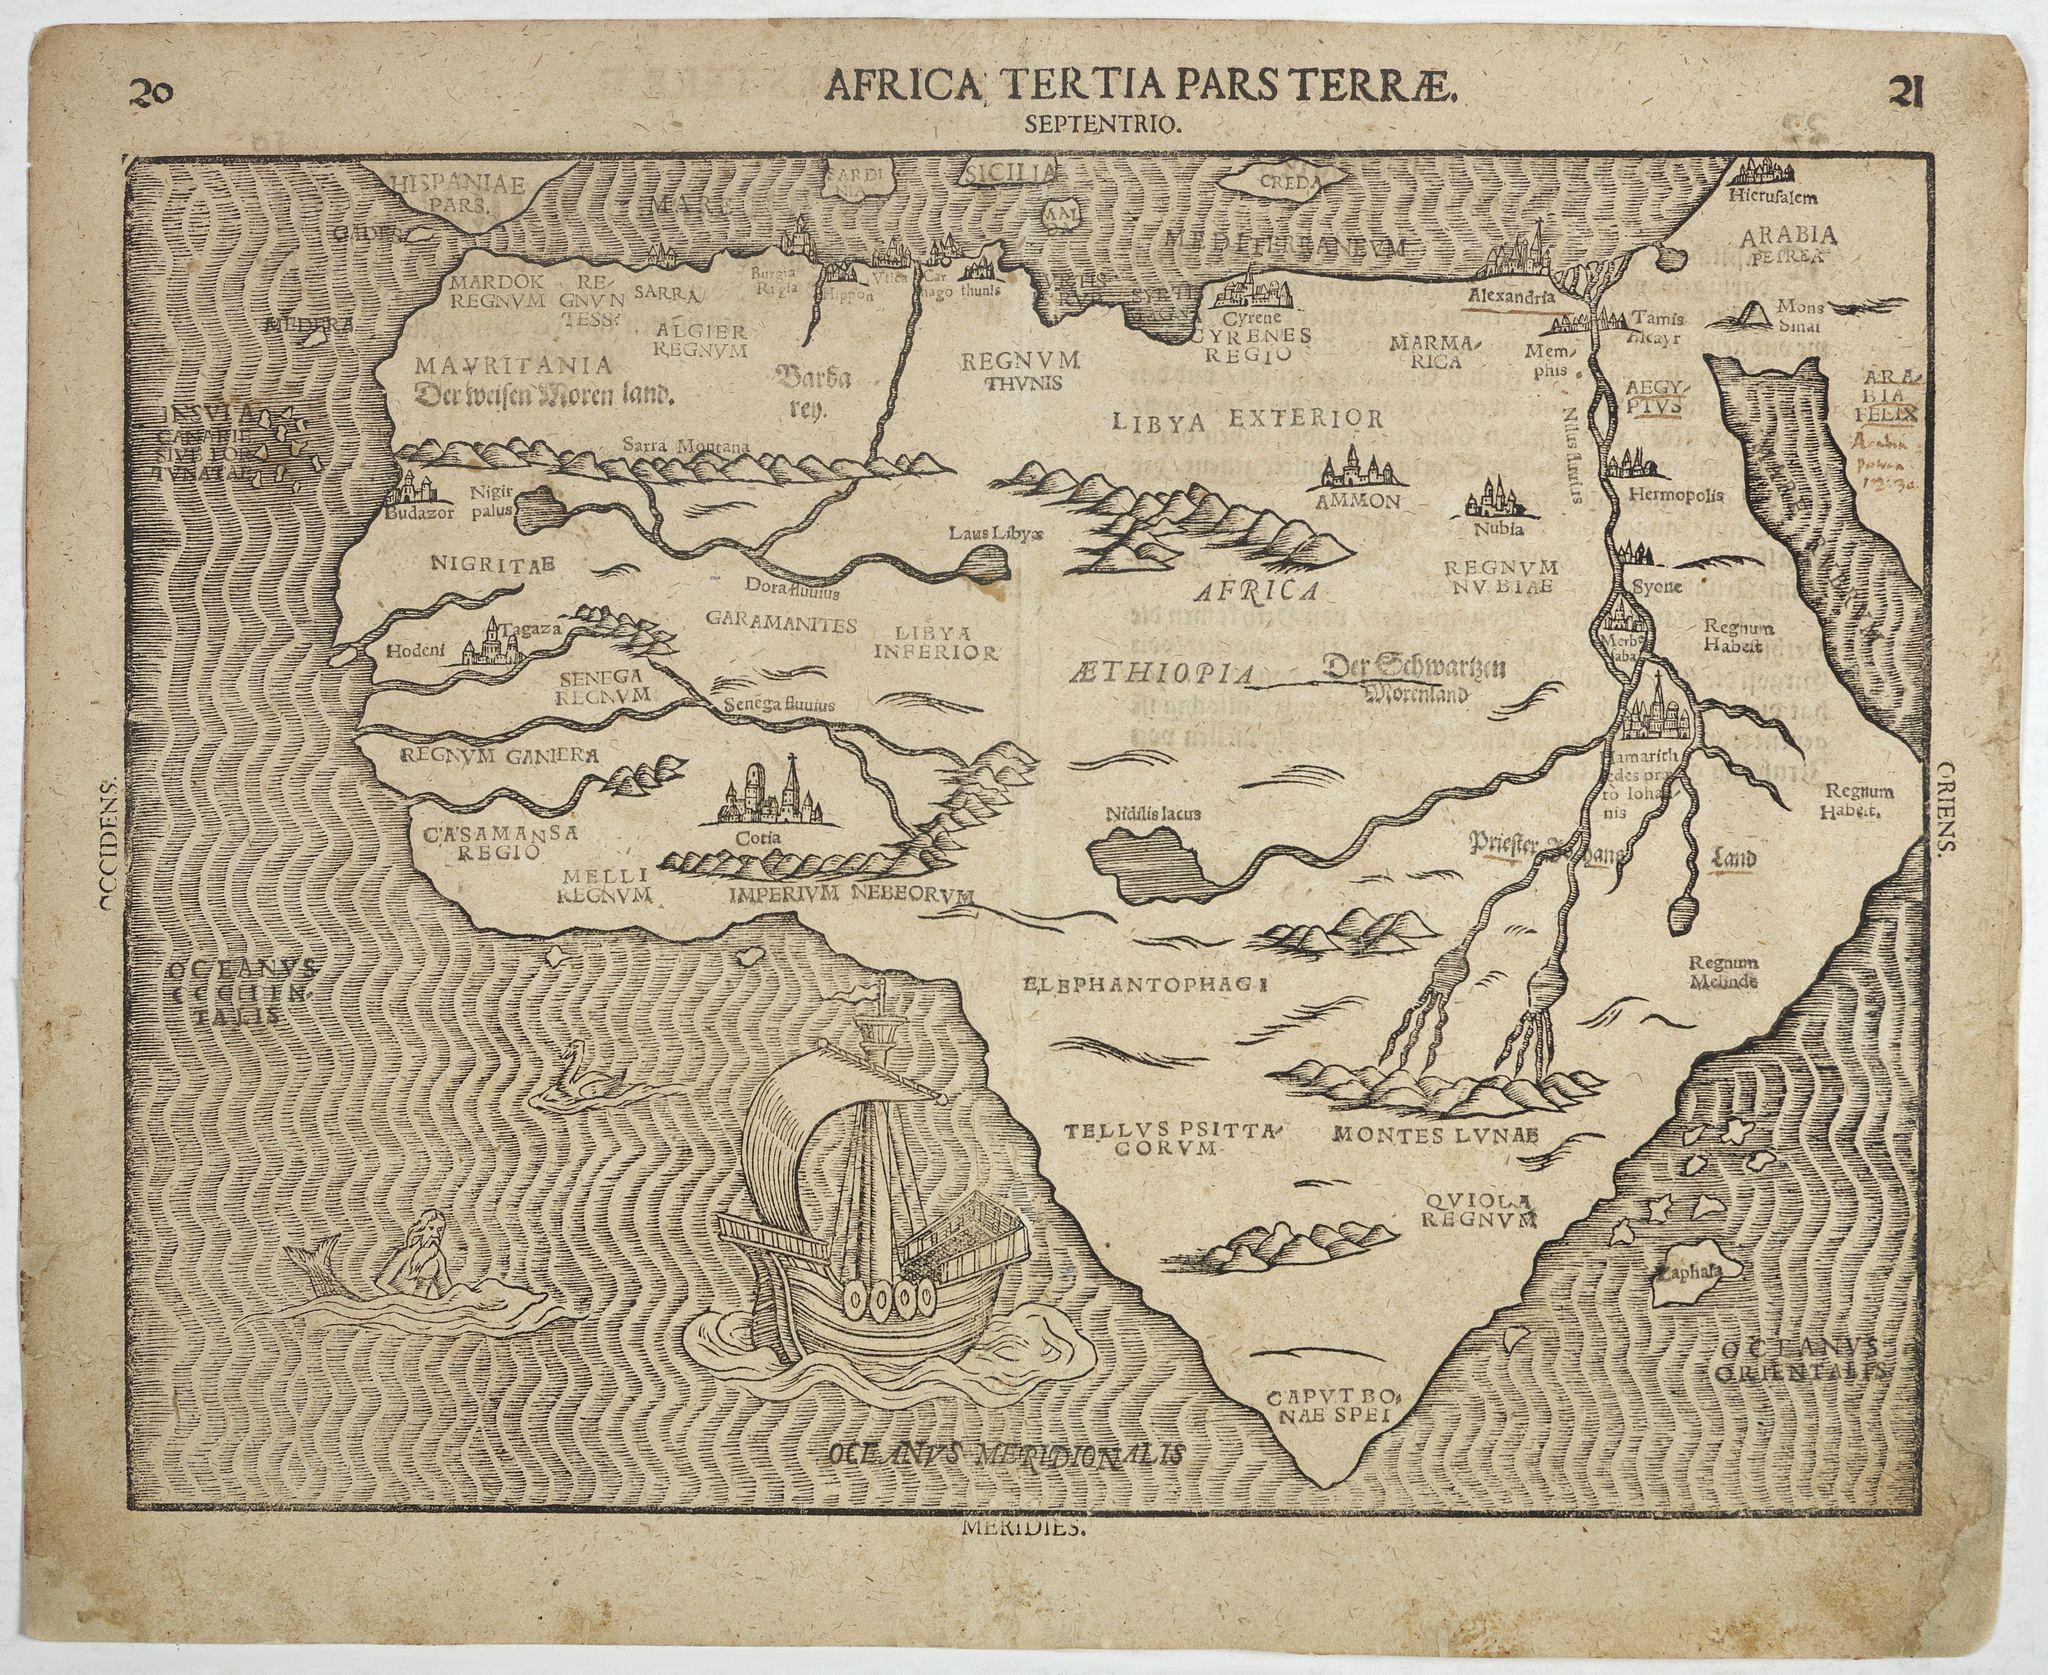 BÜNTING, H. - Africa Tertia pars Terrae.